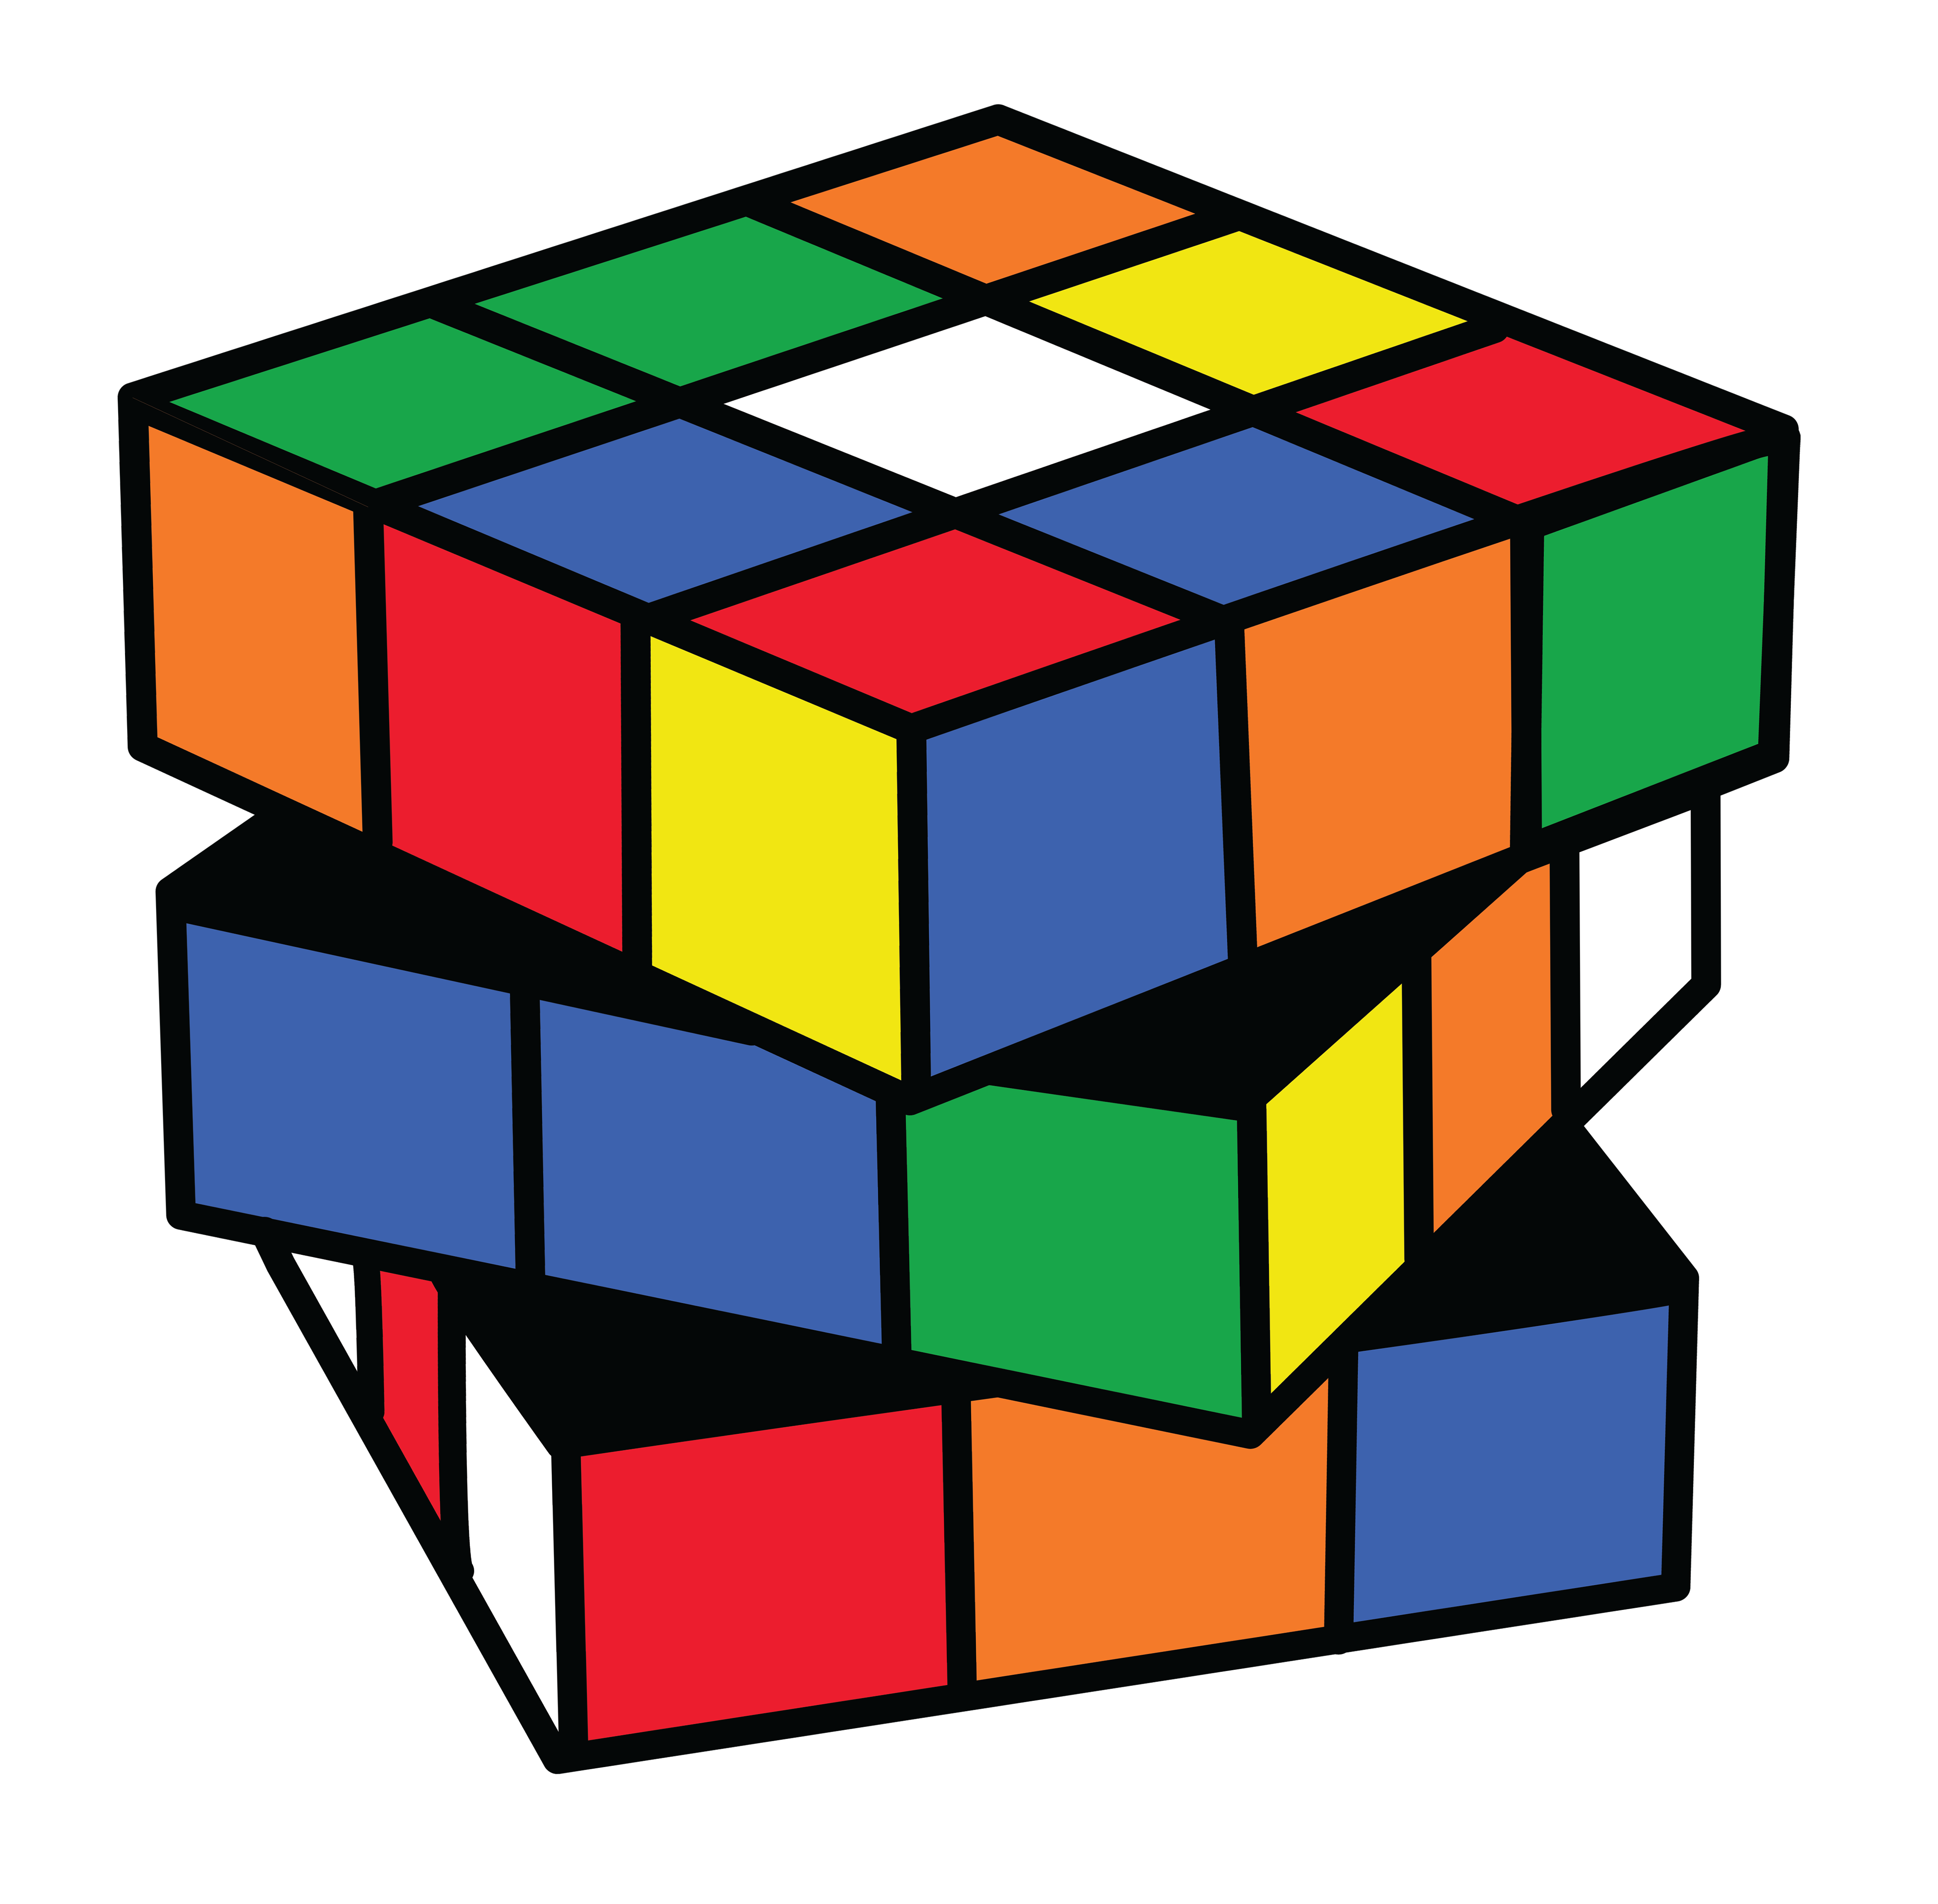 Puzzle clipart share toy. Rubix cube color clip